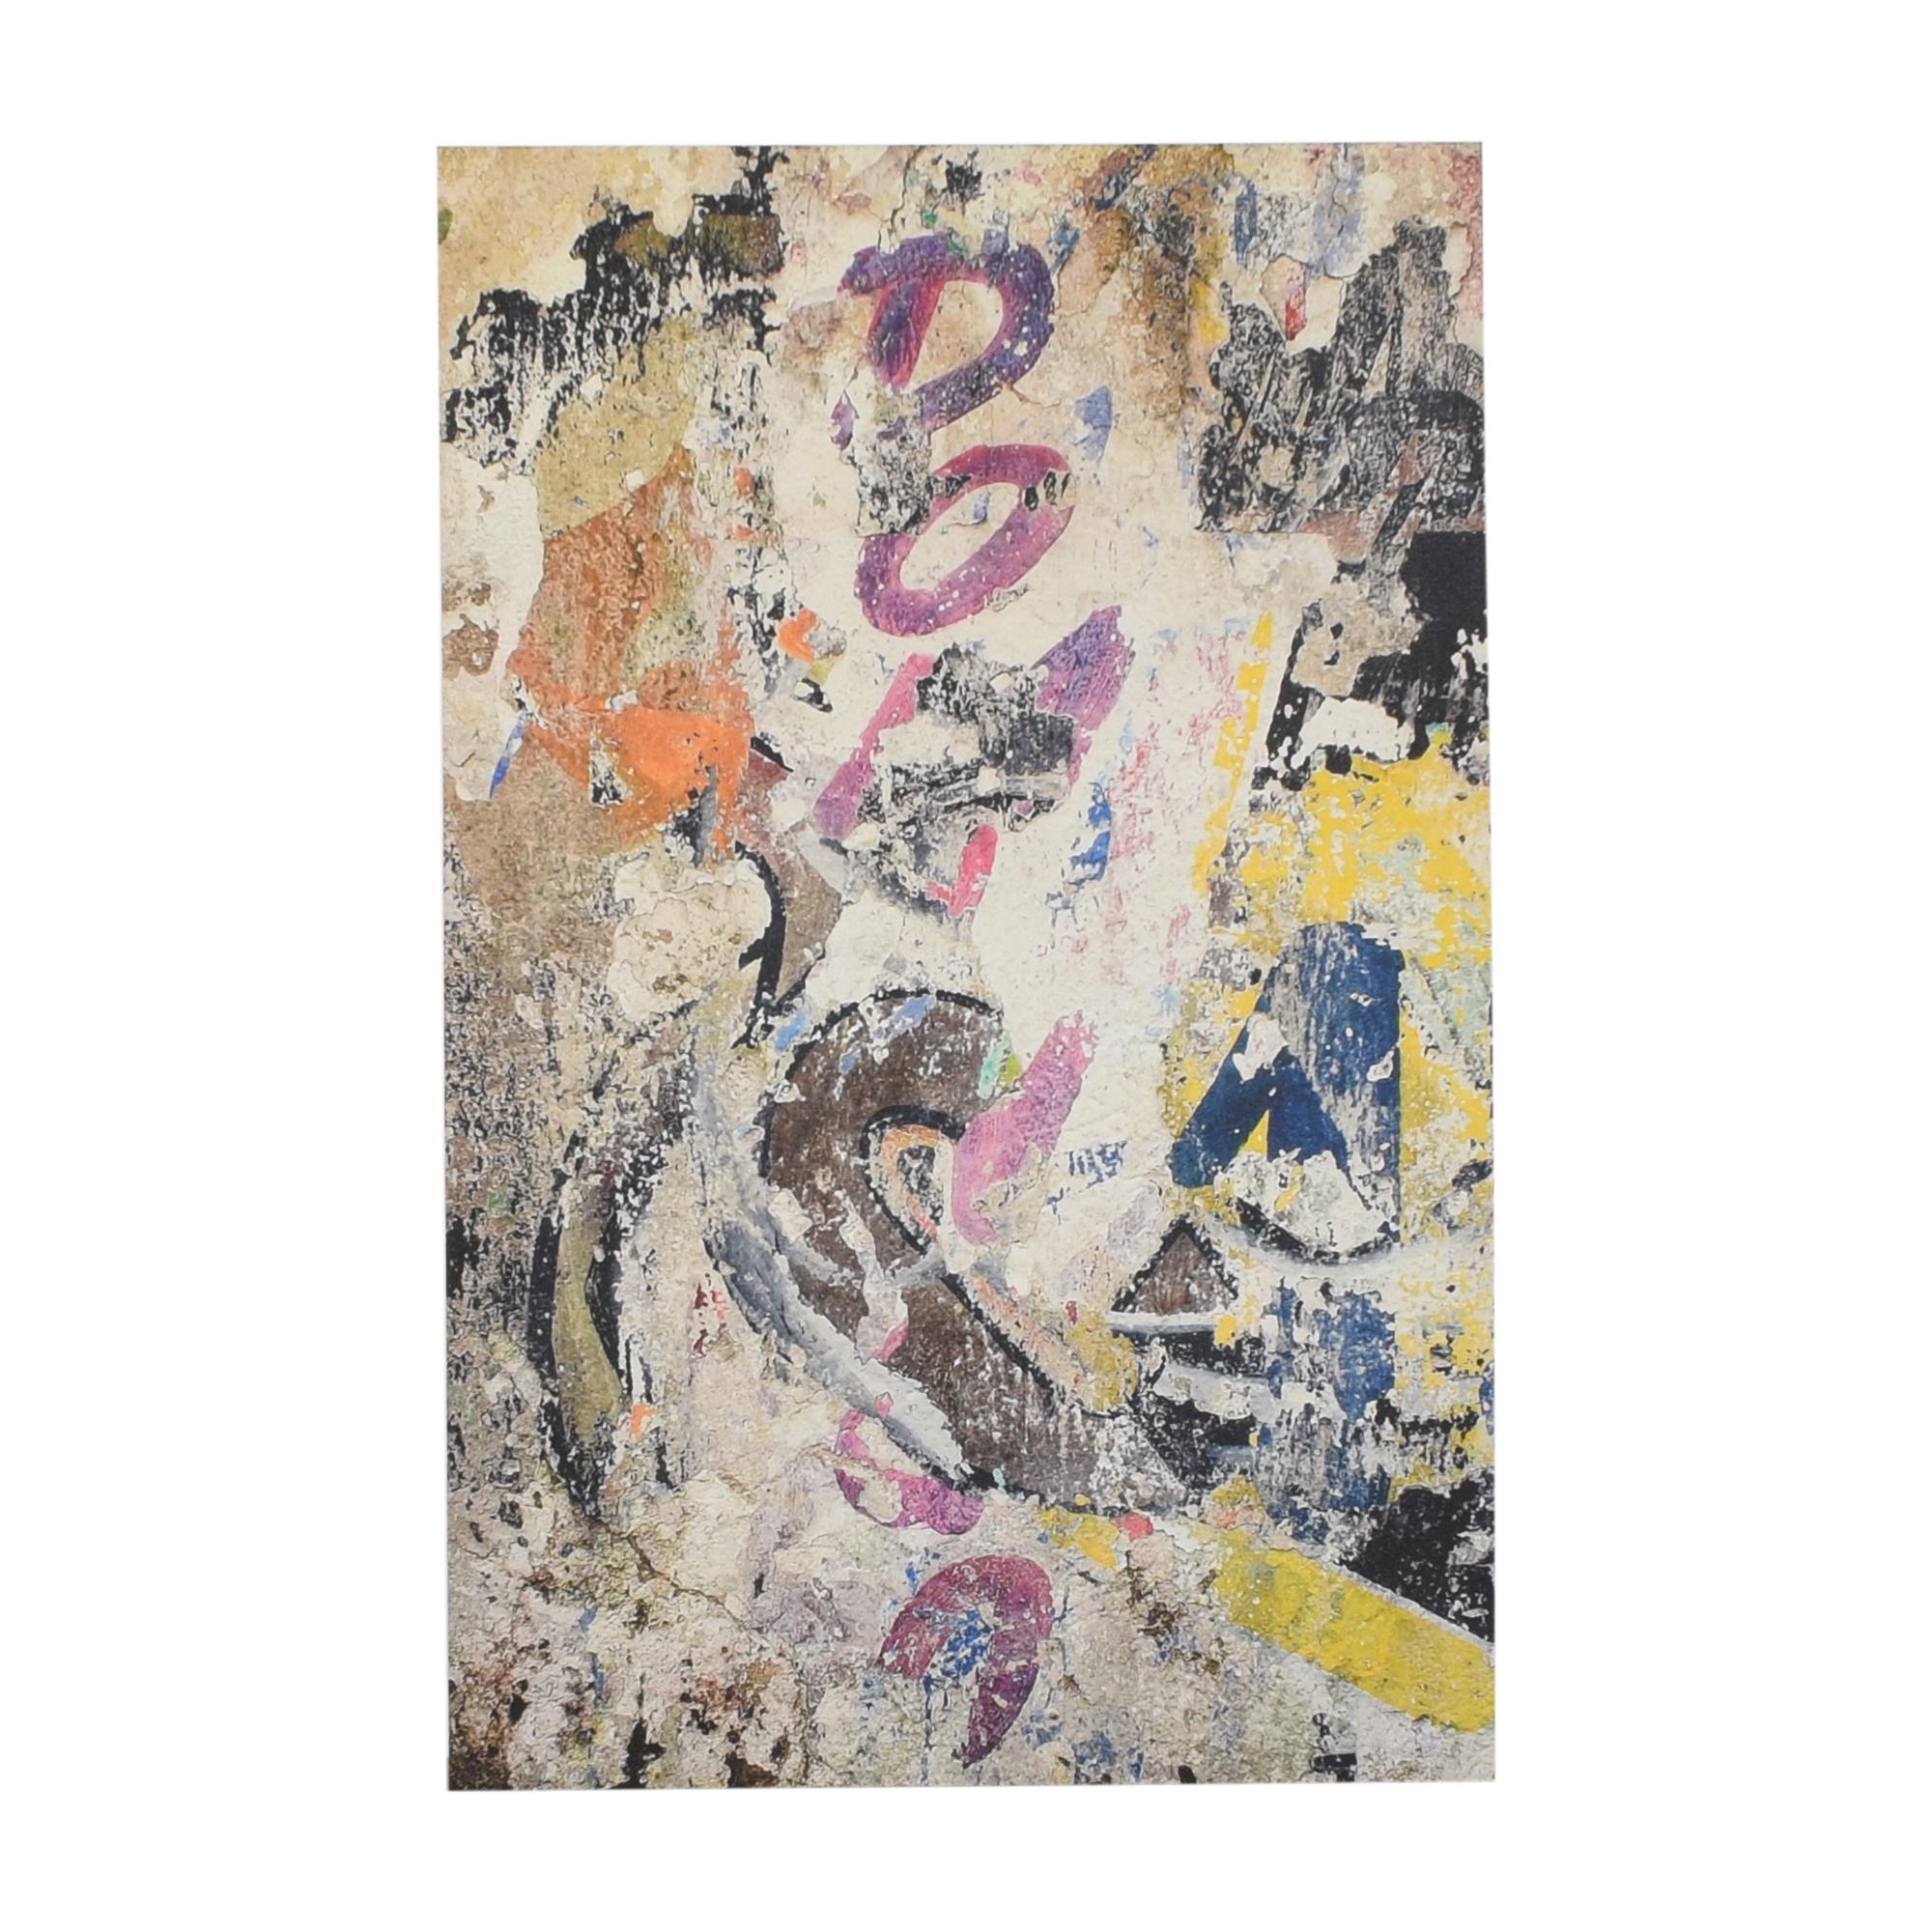 Michael Heller Cozumel 59 Wall Art multi